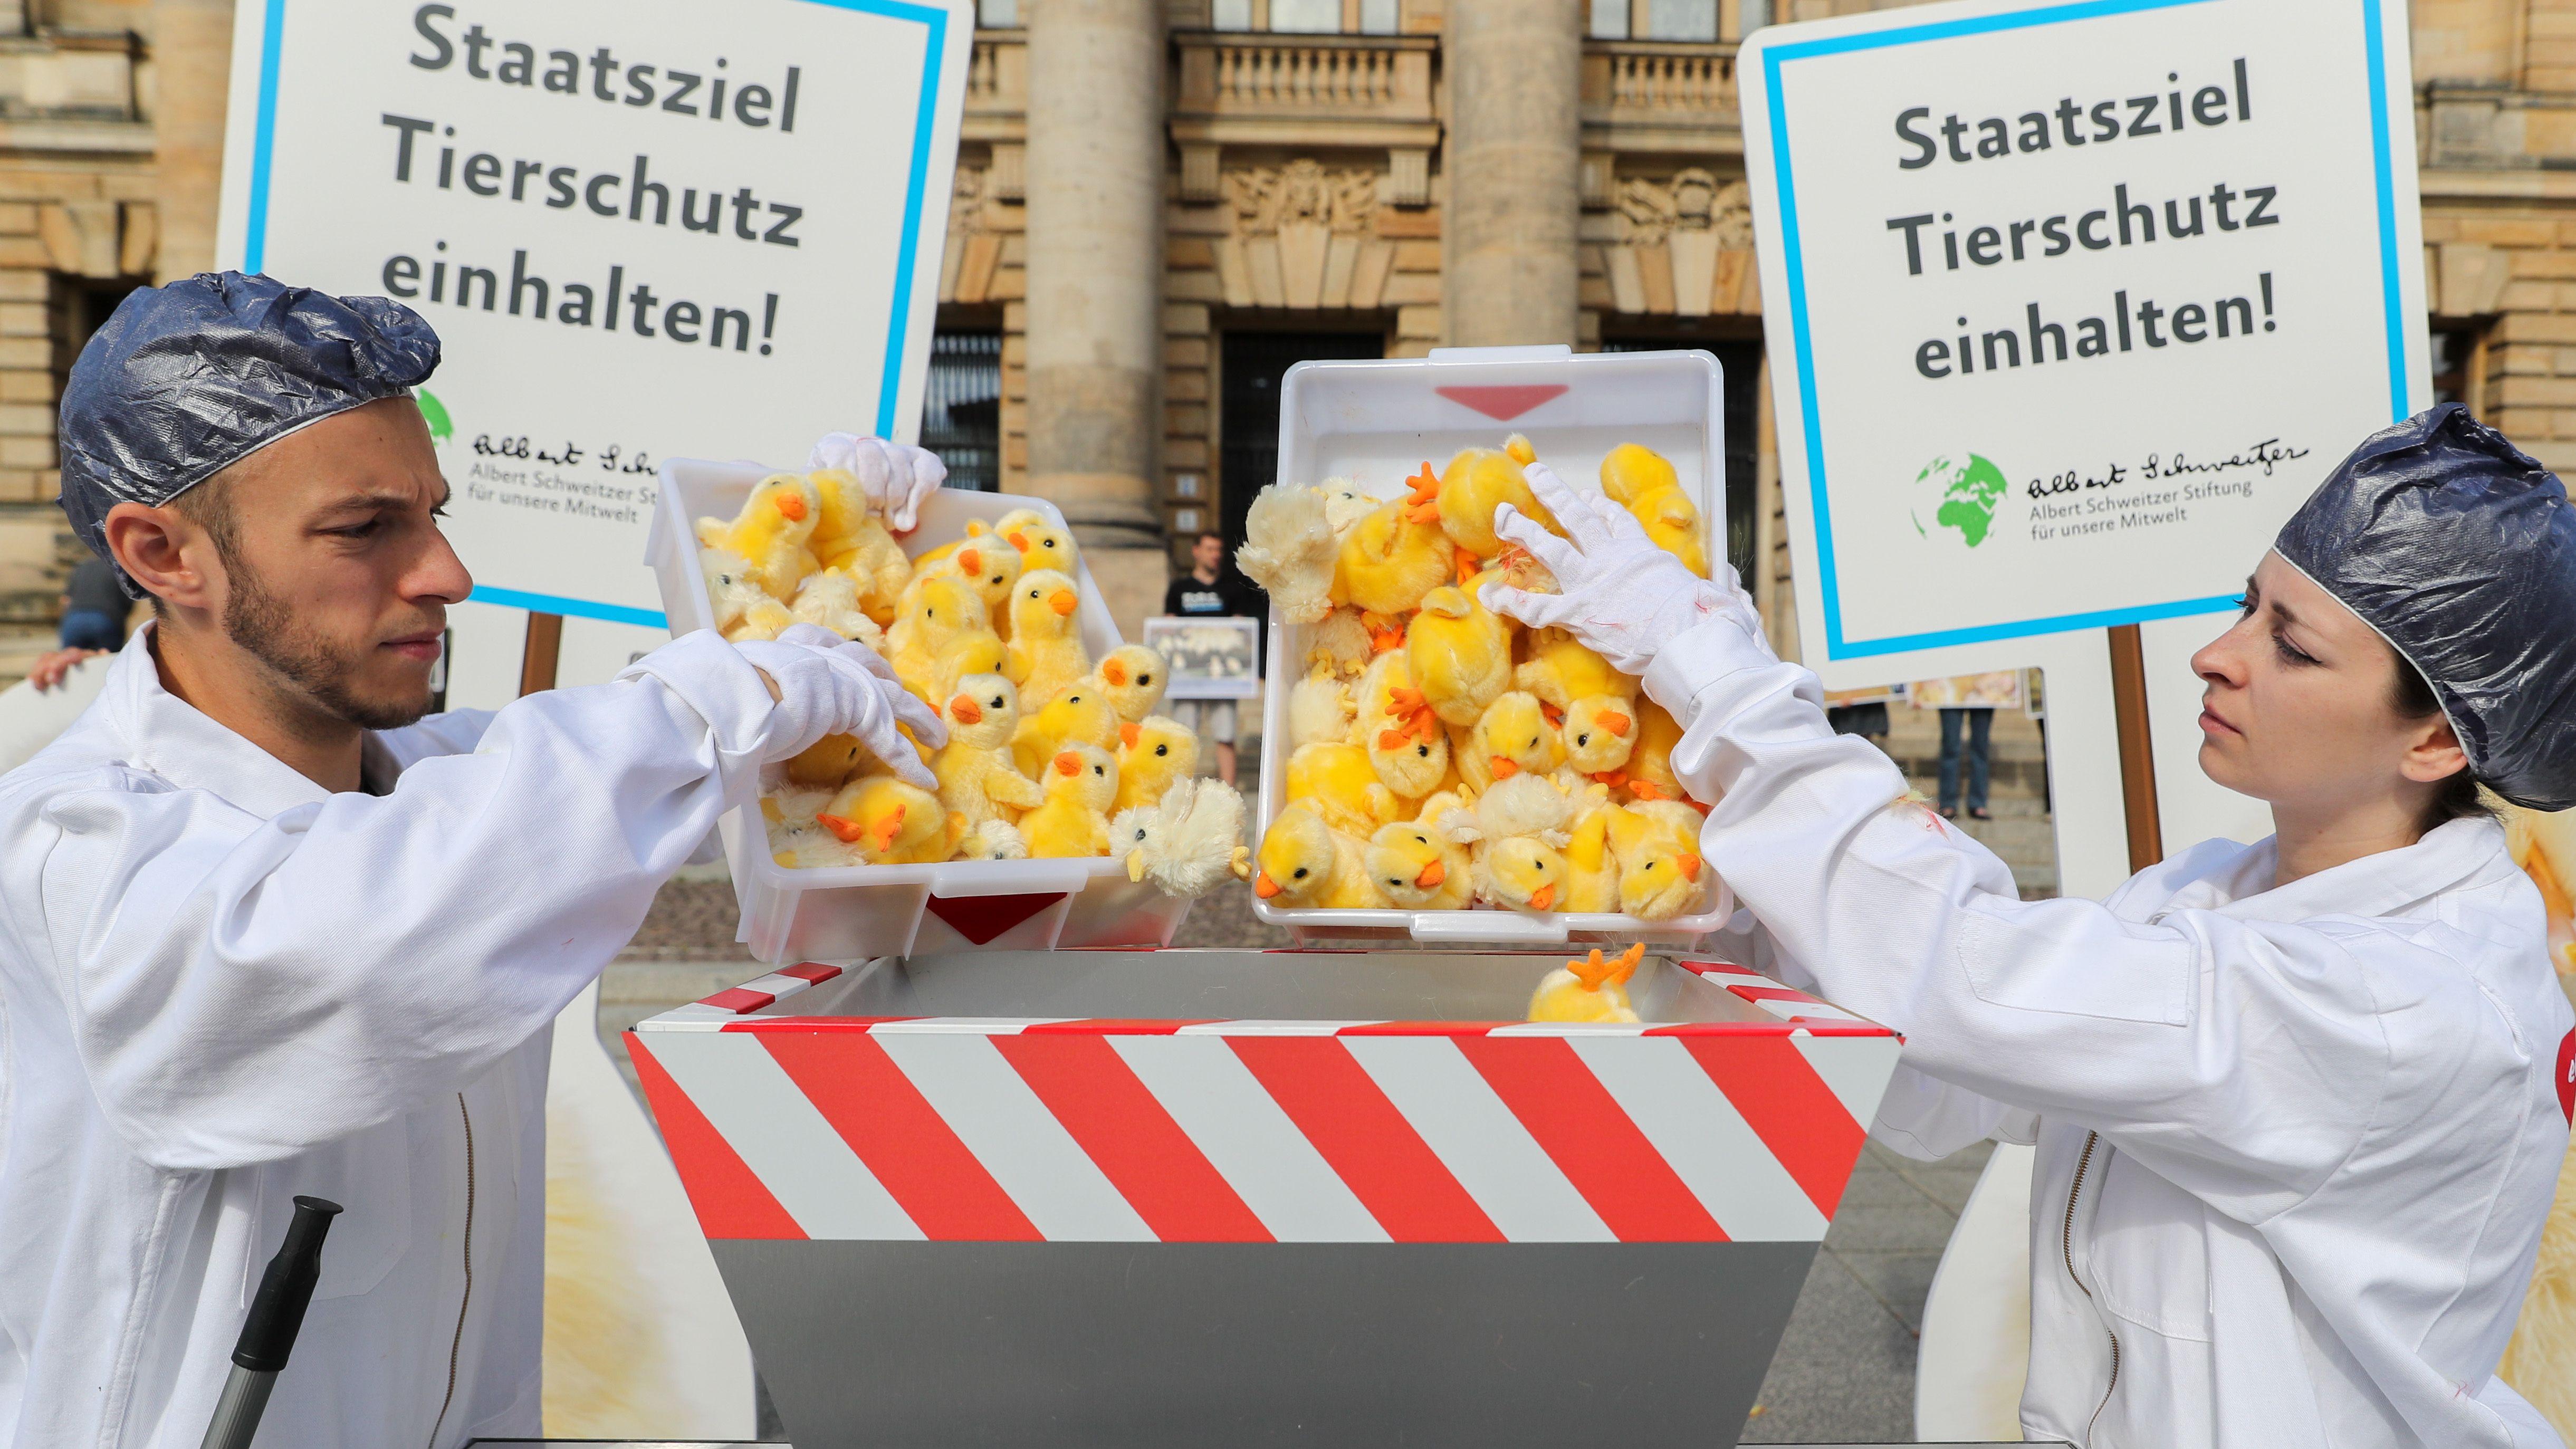 Klöckner kündigt Ausstieg aus Kükentöten bis 2021